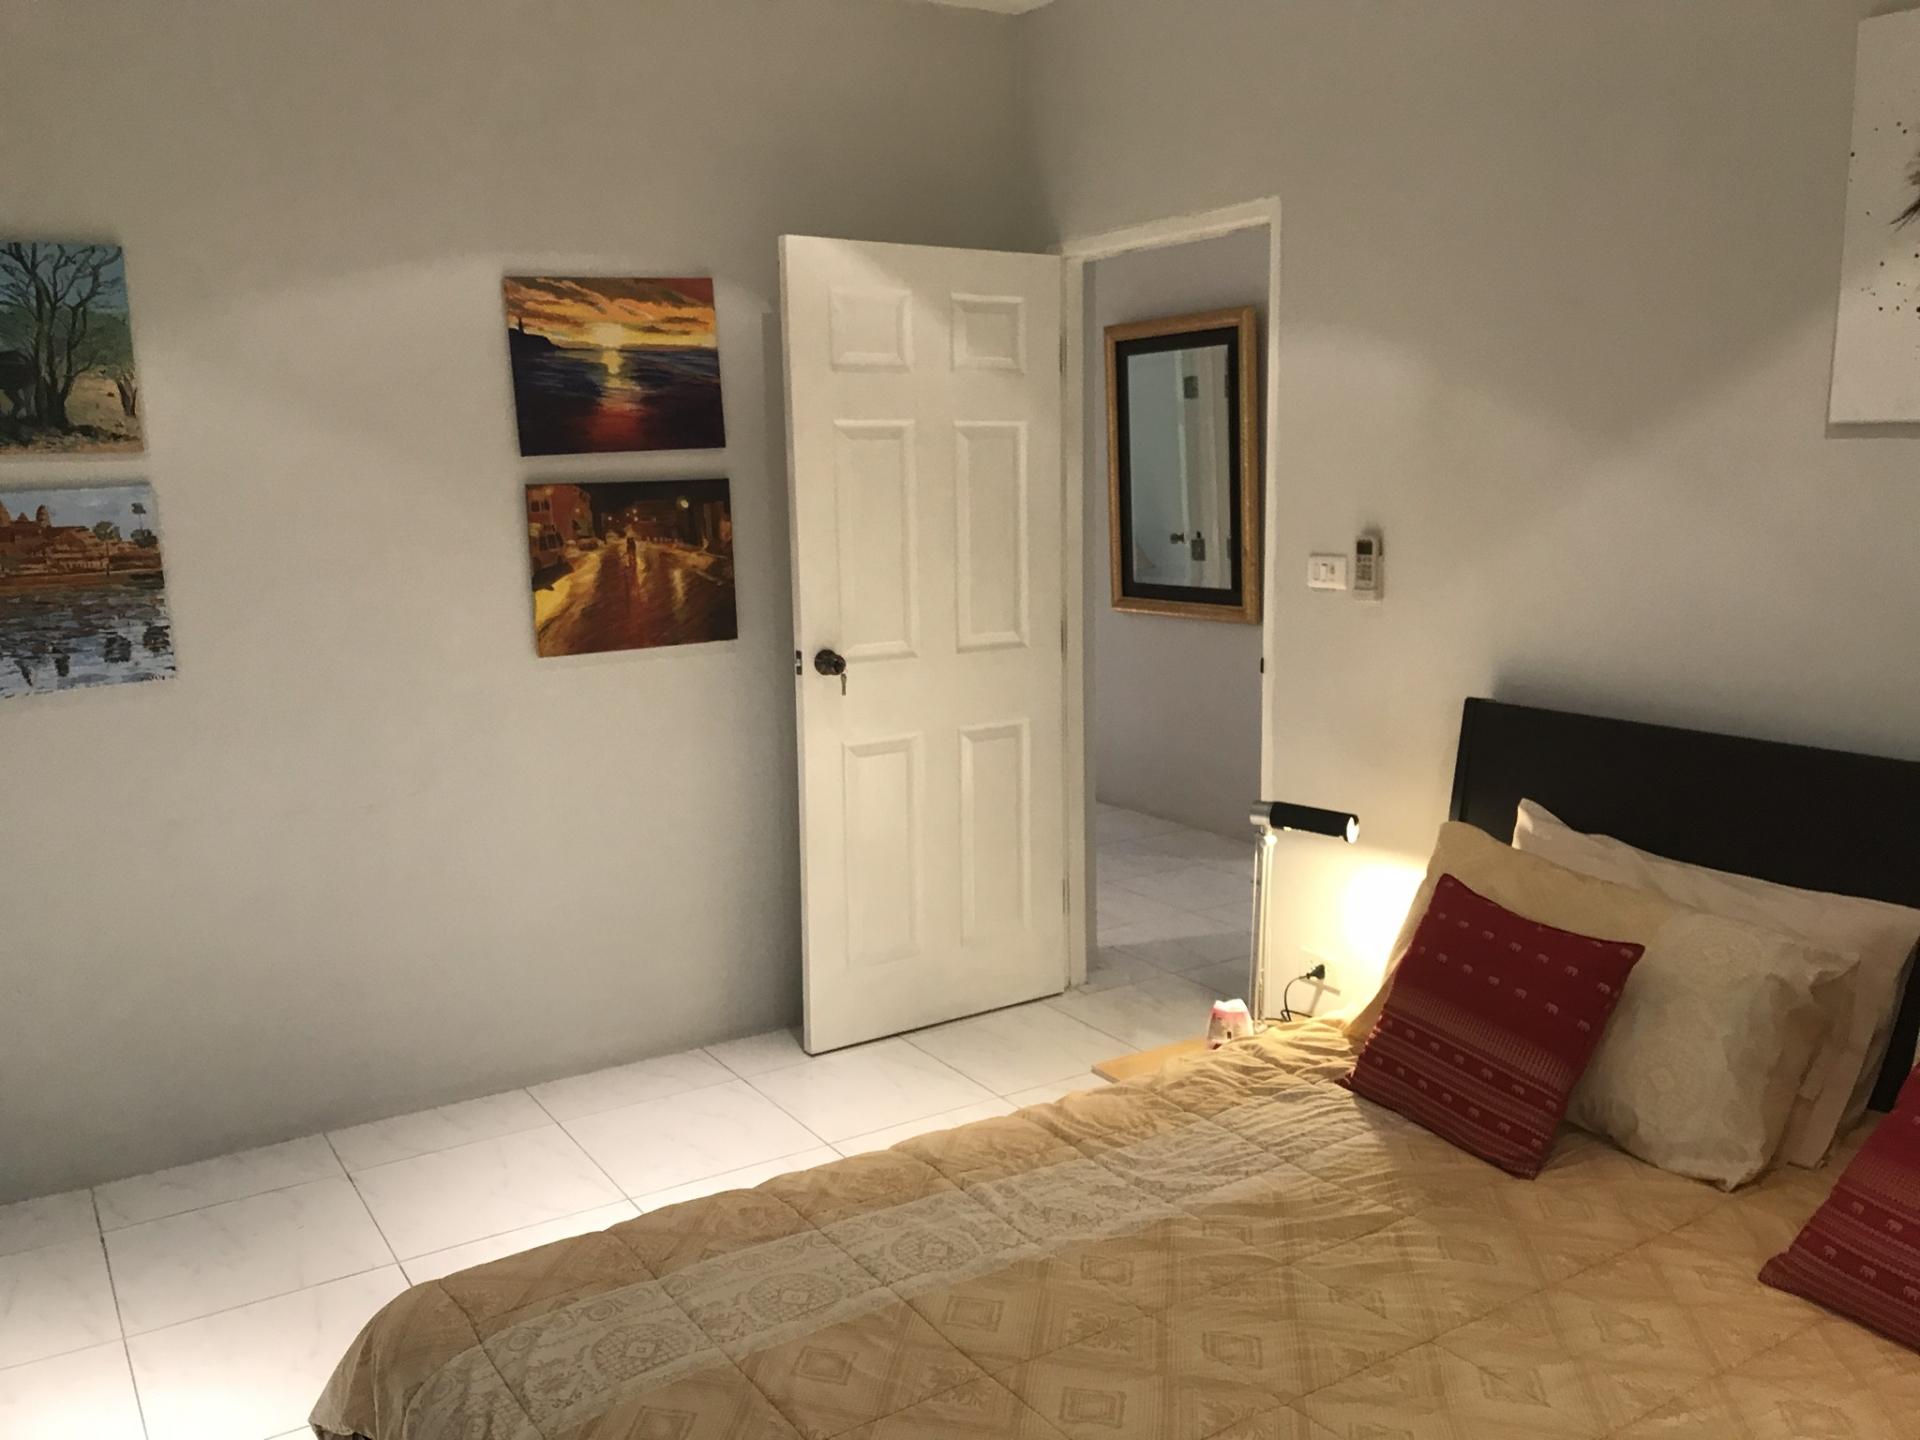 3 Bedroom House near Blue Canyon-IMG_0148.JPG